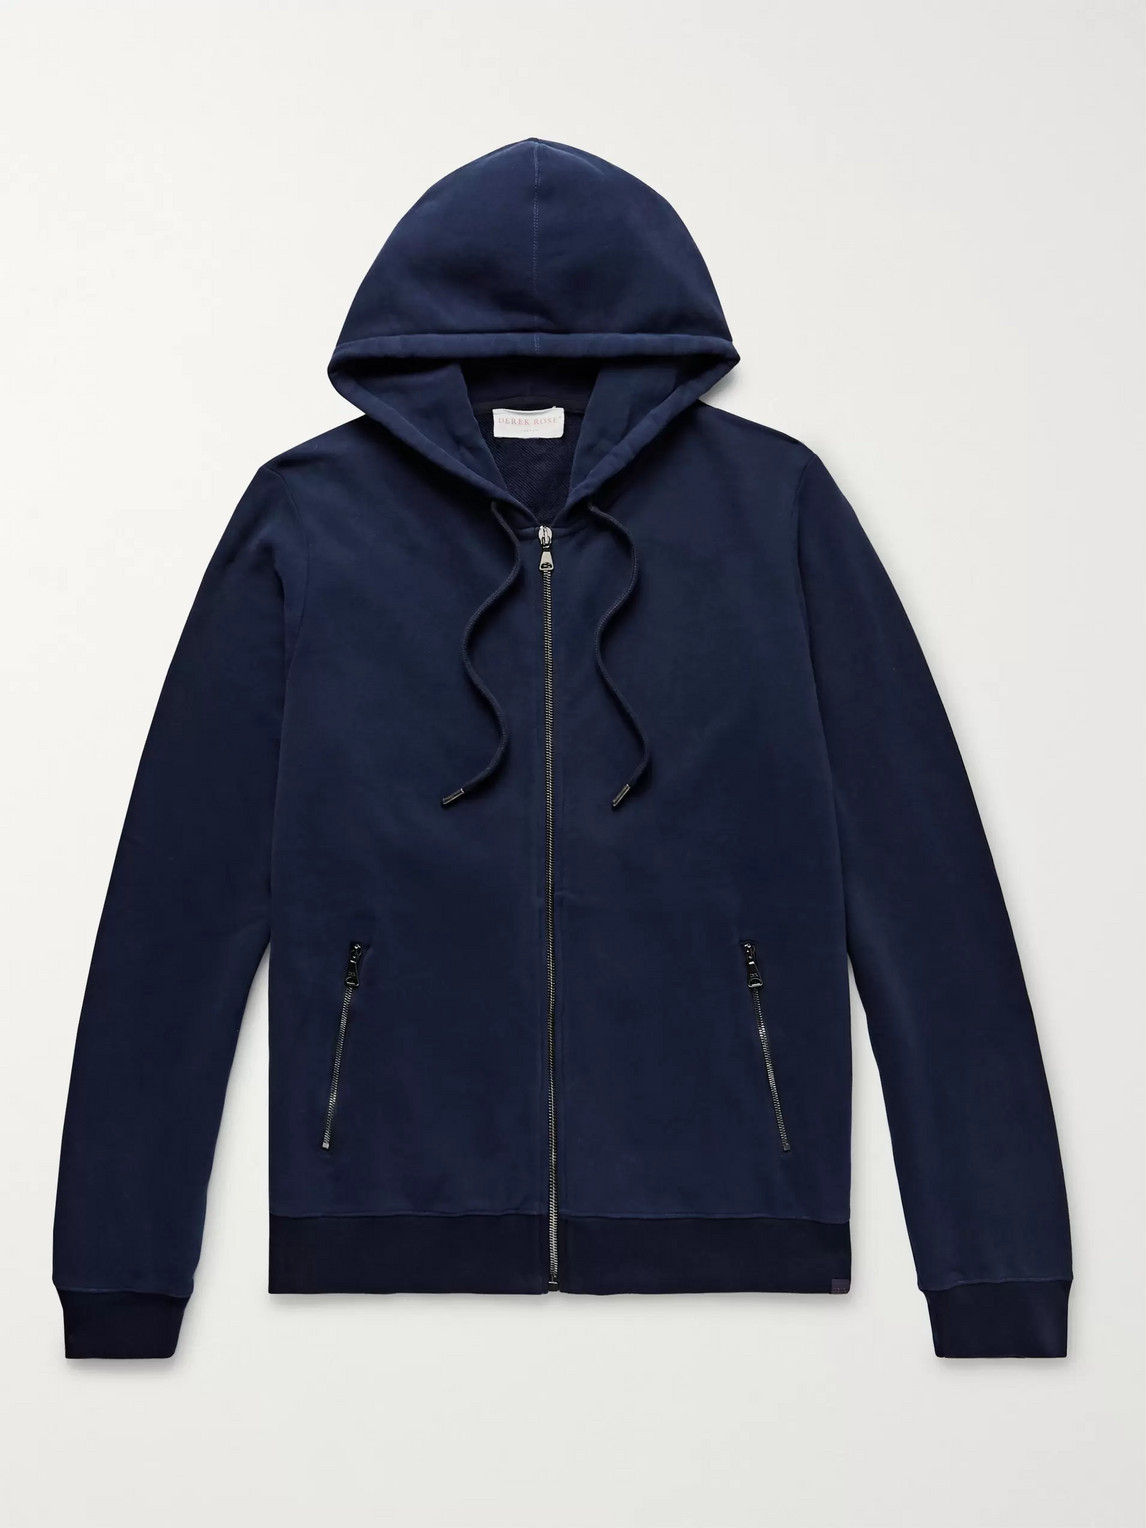 derek rose - devon brushed loopback cotton-jersey zip-up hoodie - blue - s - men